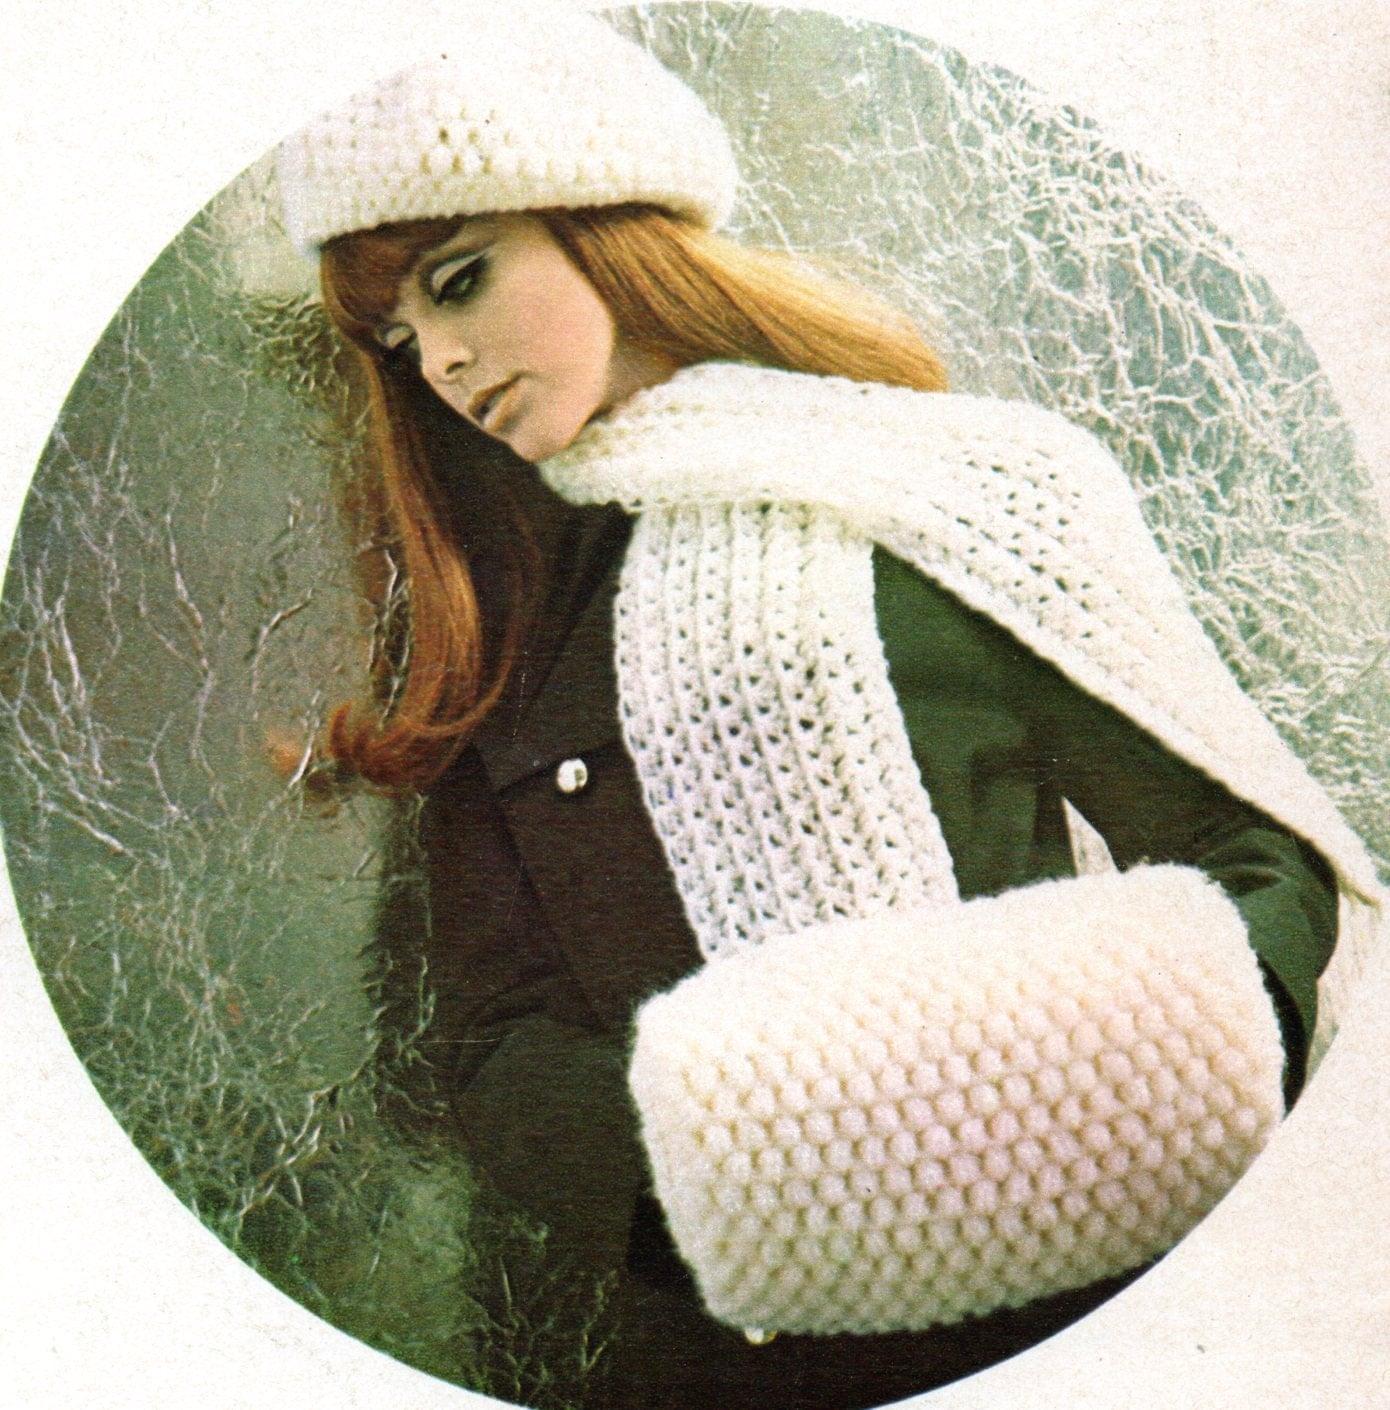 Crochet Free Pattern Muff : Vintage Muff Hand Warmer Scarf and Beret Crochet Pattern Woman